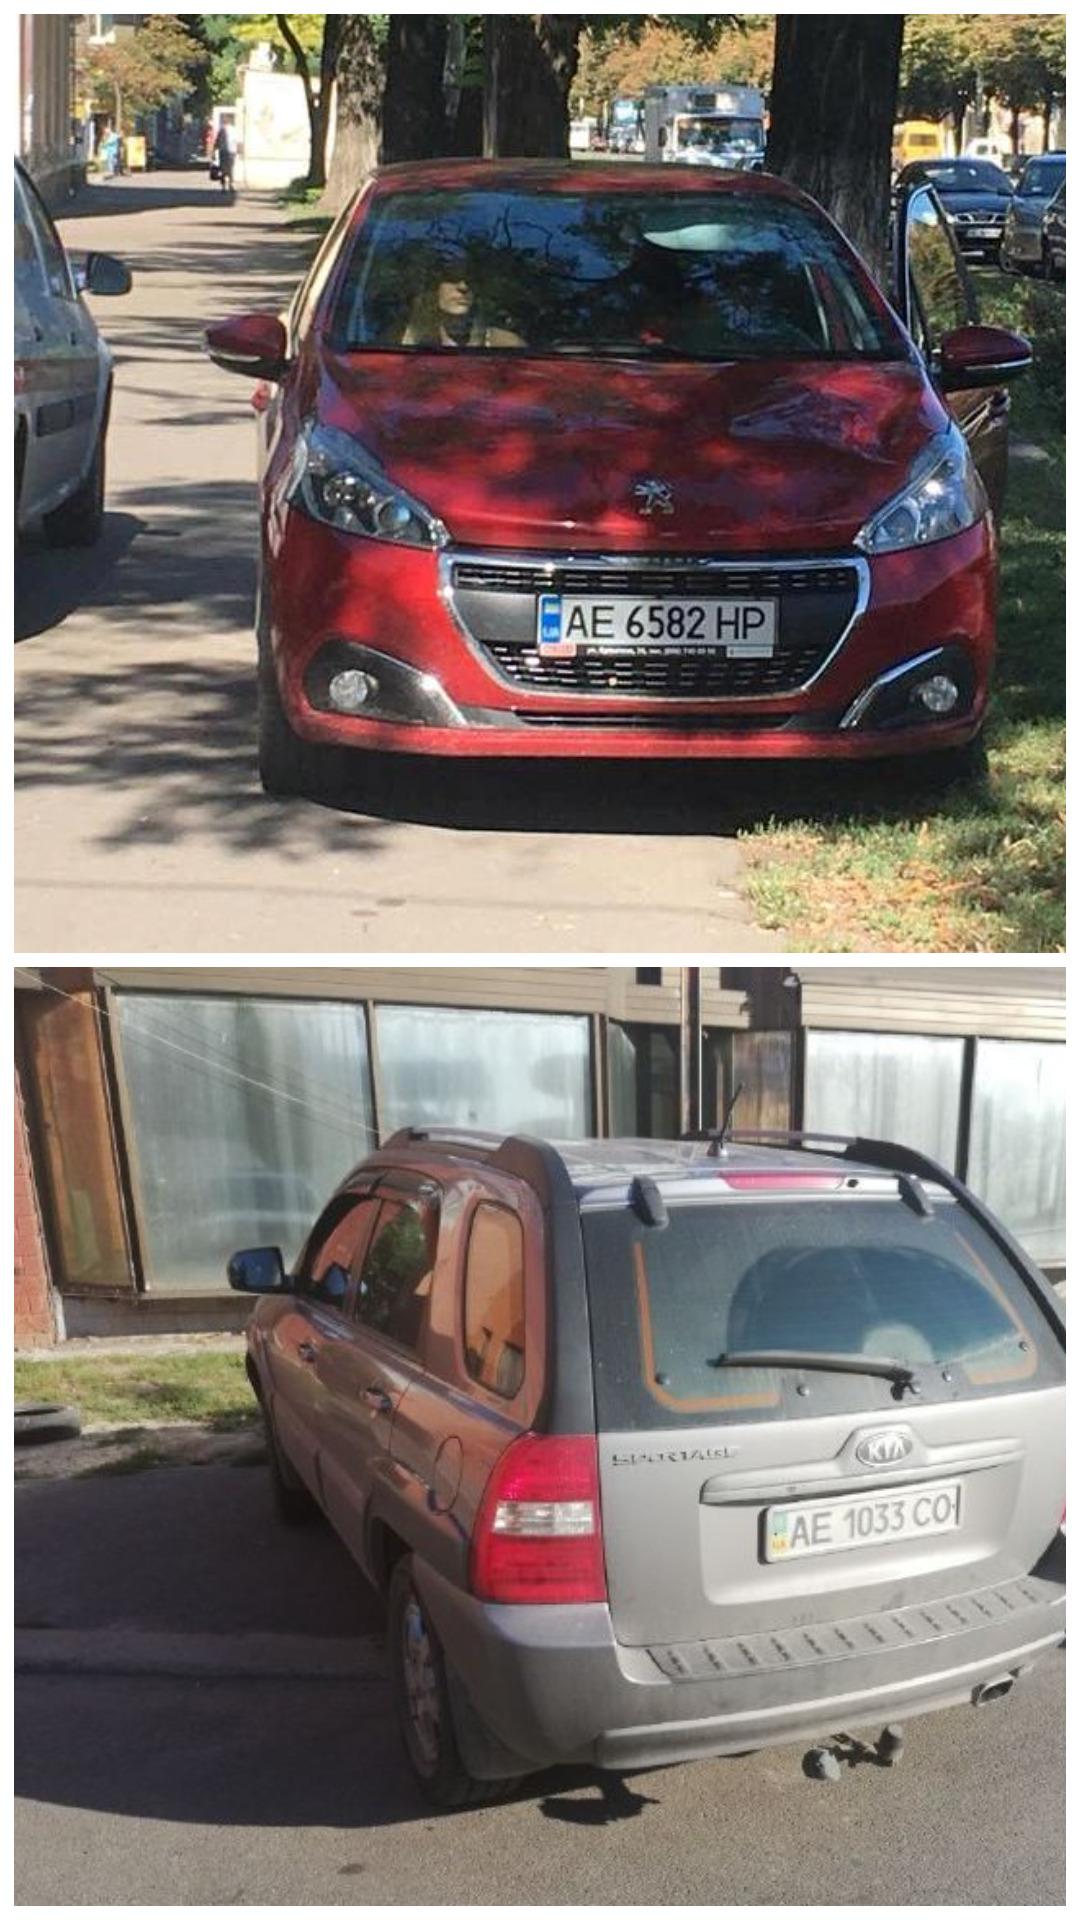 Peugeot 208 с номером АЕ 6582 НР и Kia Sportage с номером АЕ 1033 СО